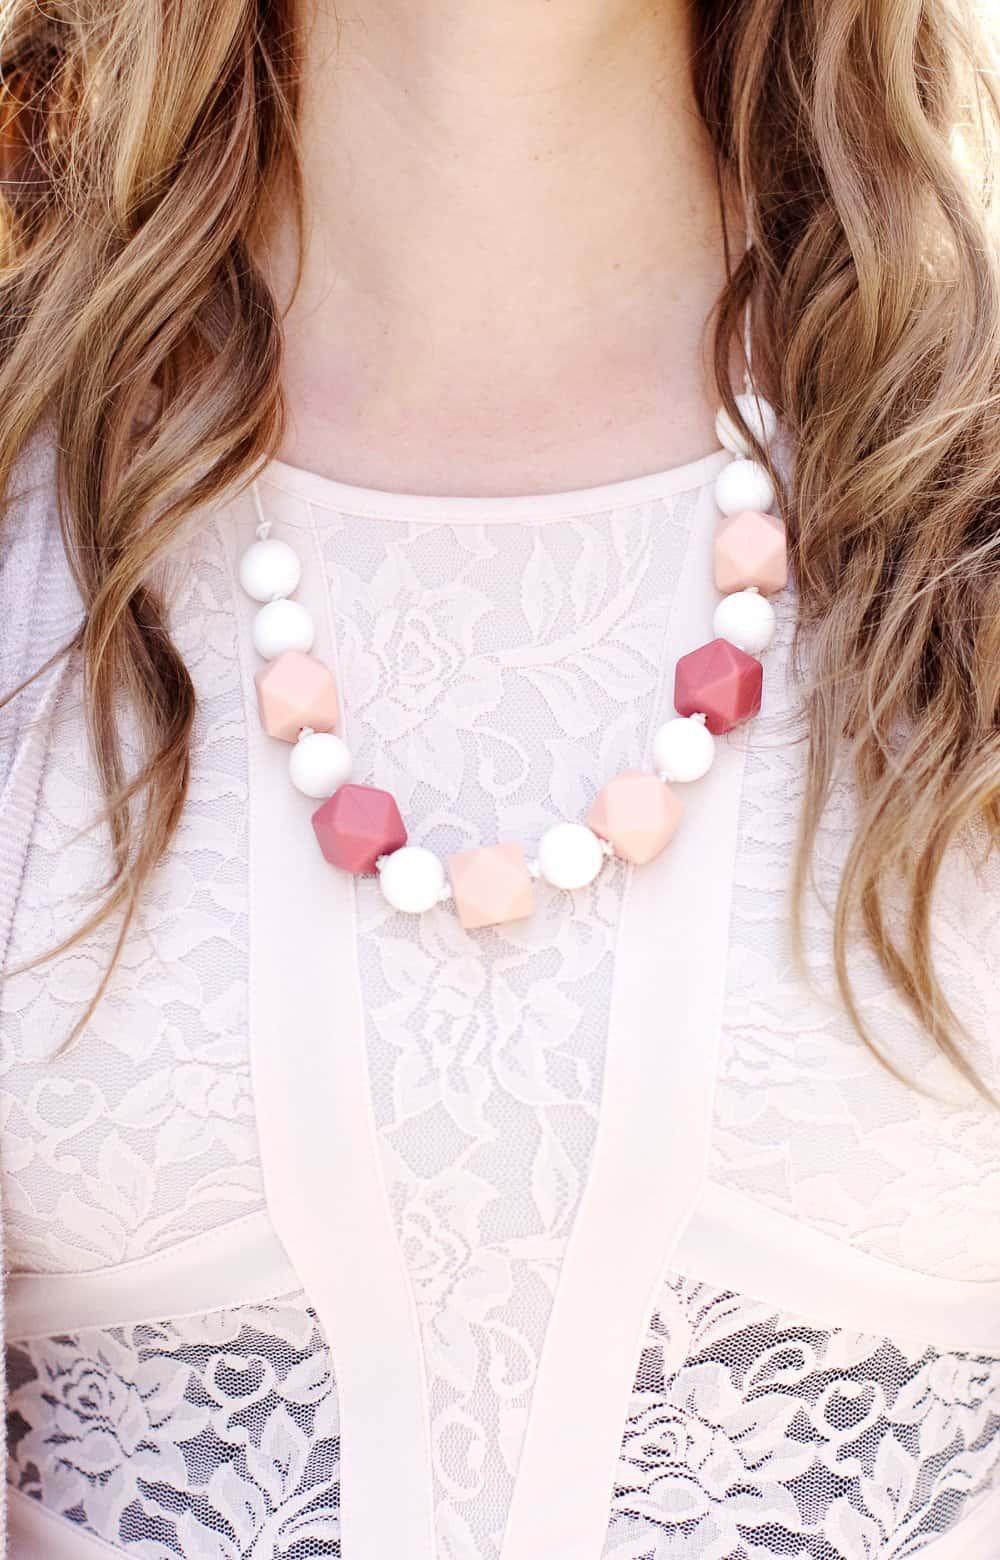 DIY Teething Necklace | DIY Baby | Silicone Teething Necklace | Easy Teething Necklace | Teething Necklace Tutorial | How to Make A Teething Necklace || See Kate Sew #diybaby #teething #seekatesew